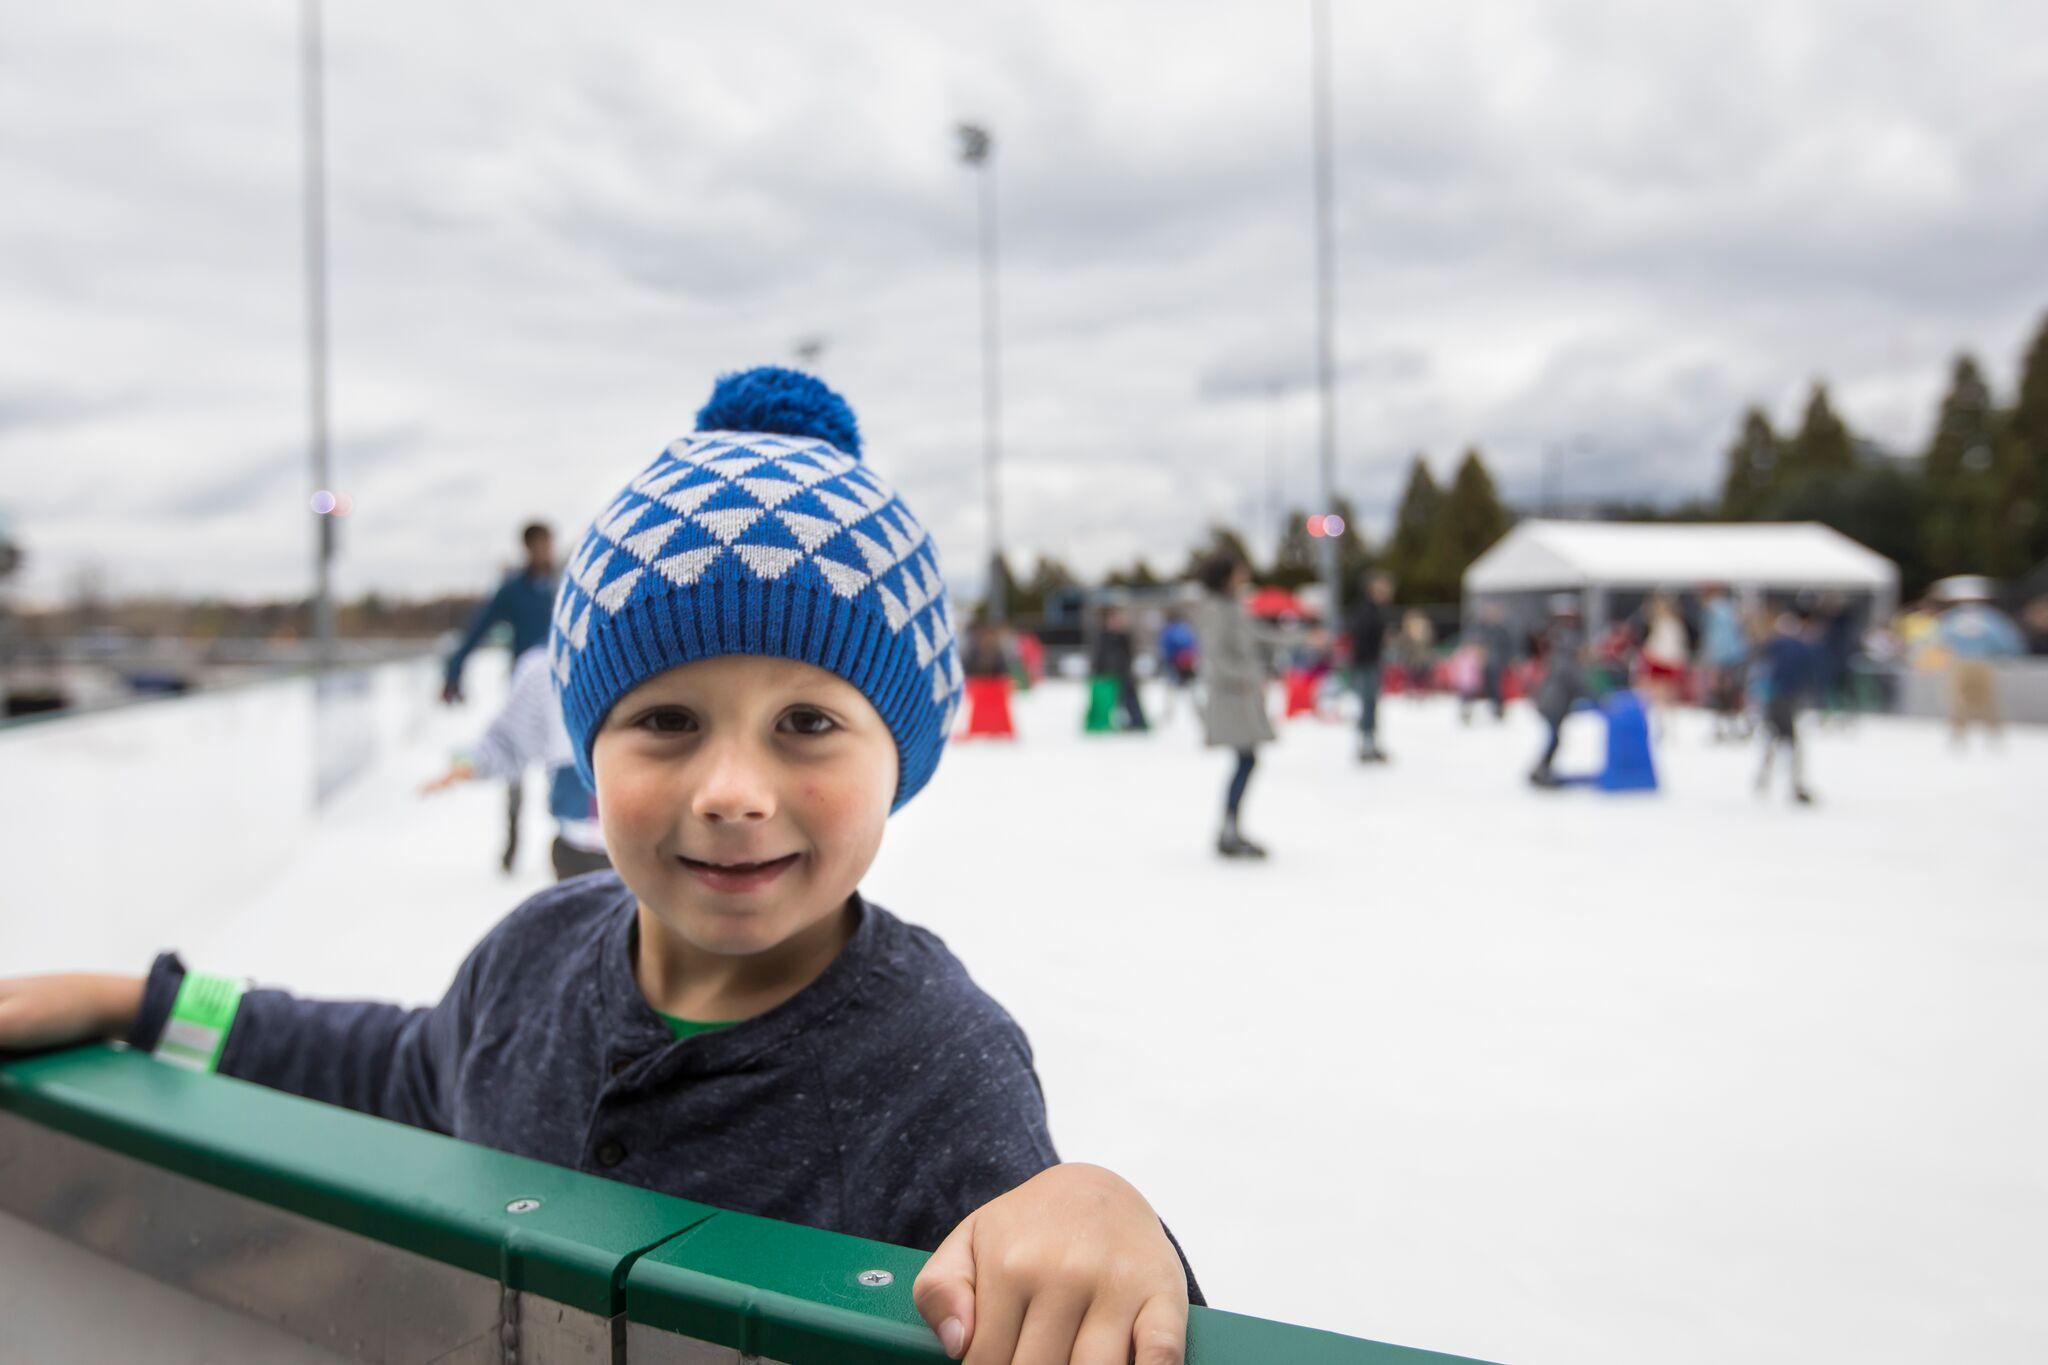 iceskating rink